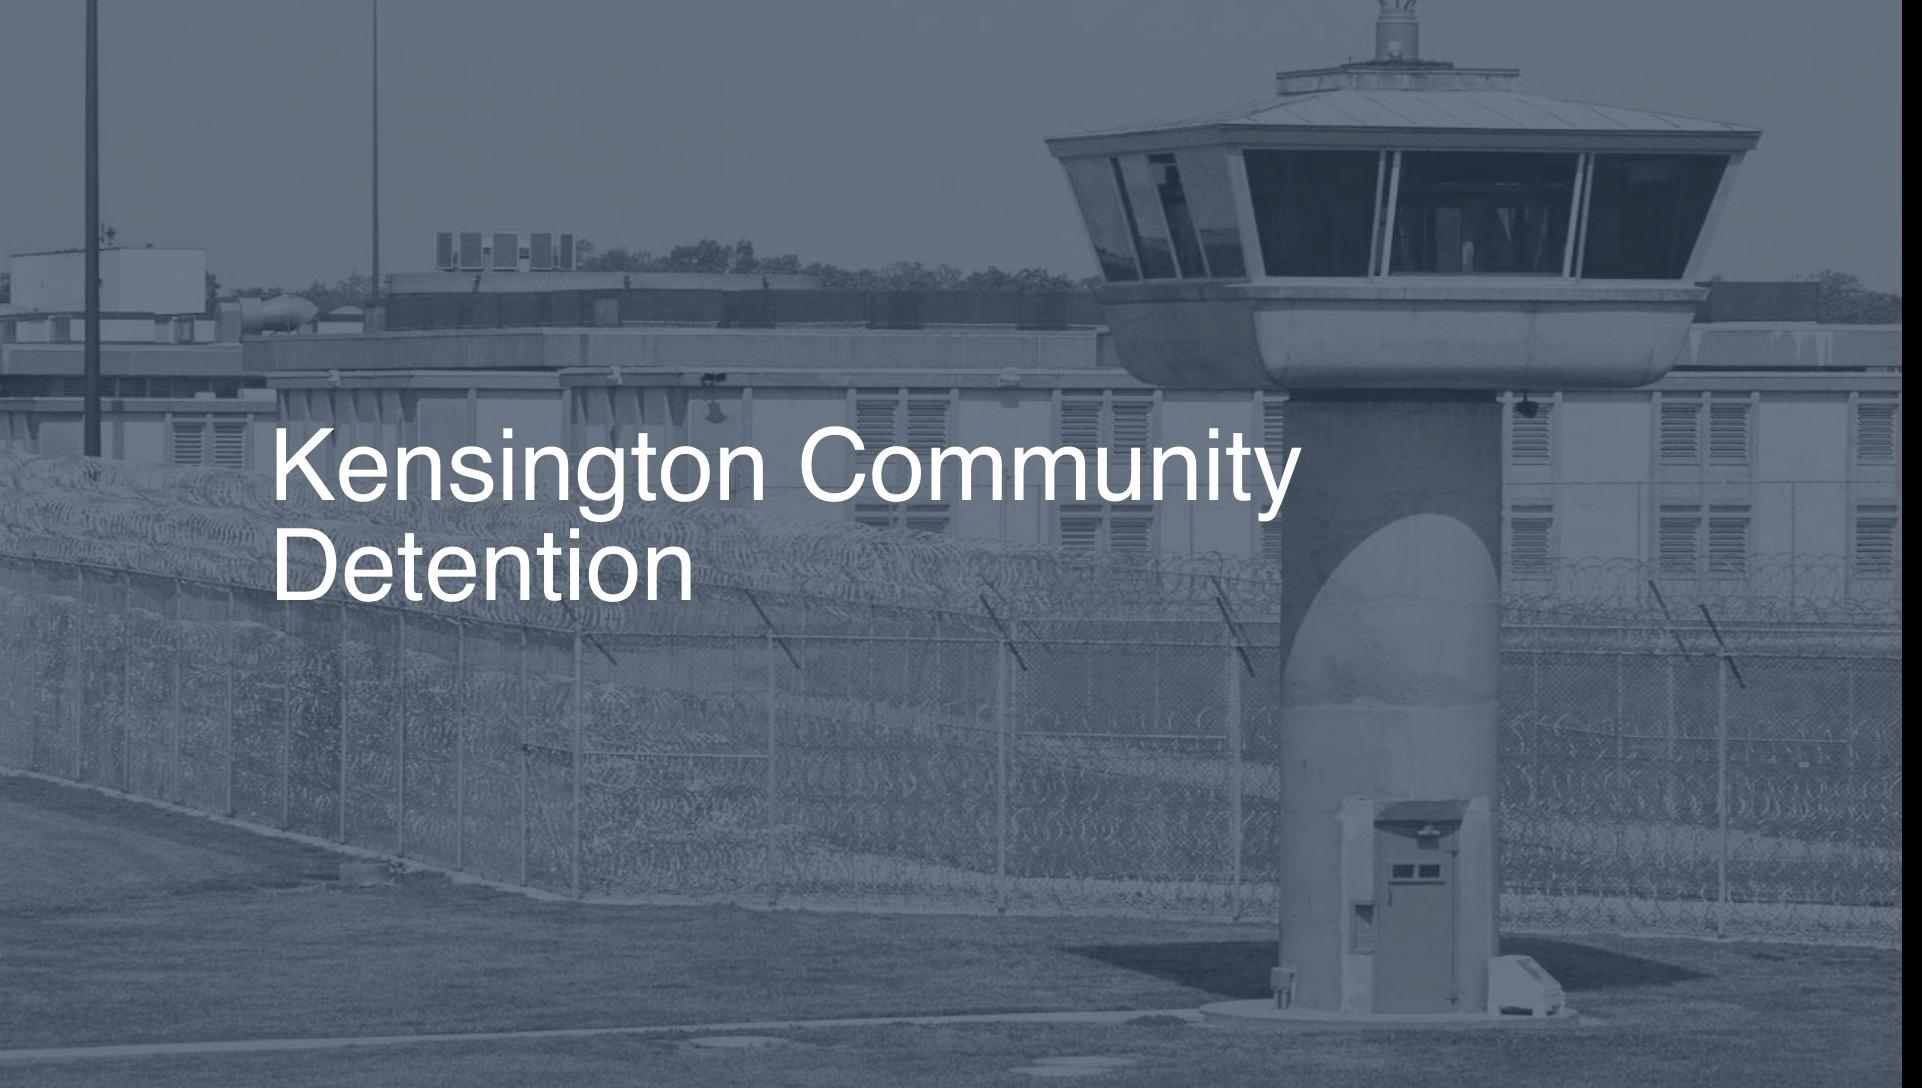 Kensington Community Detention correctional facility picture